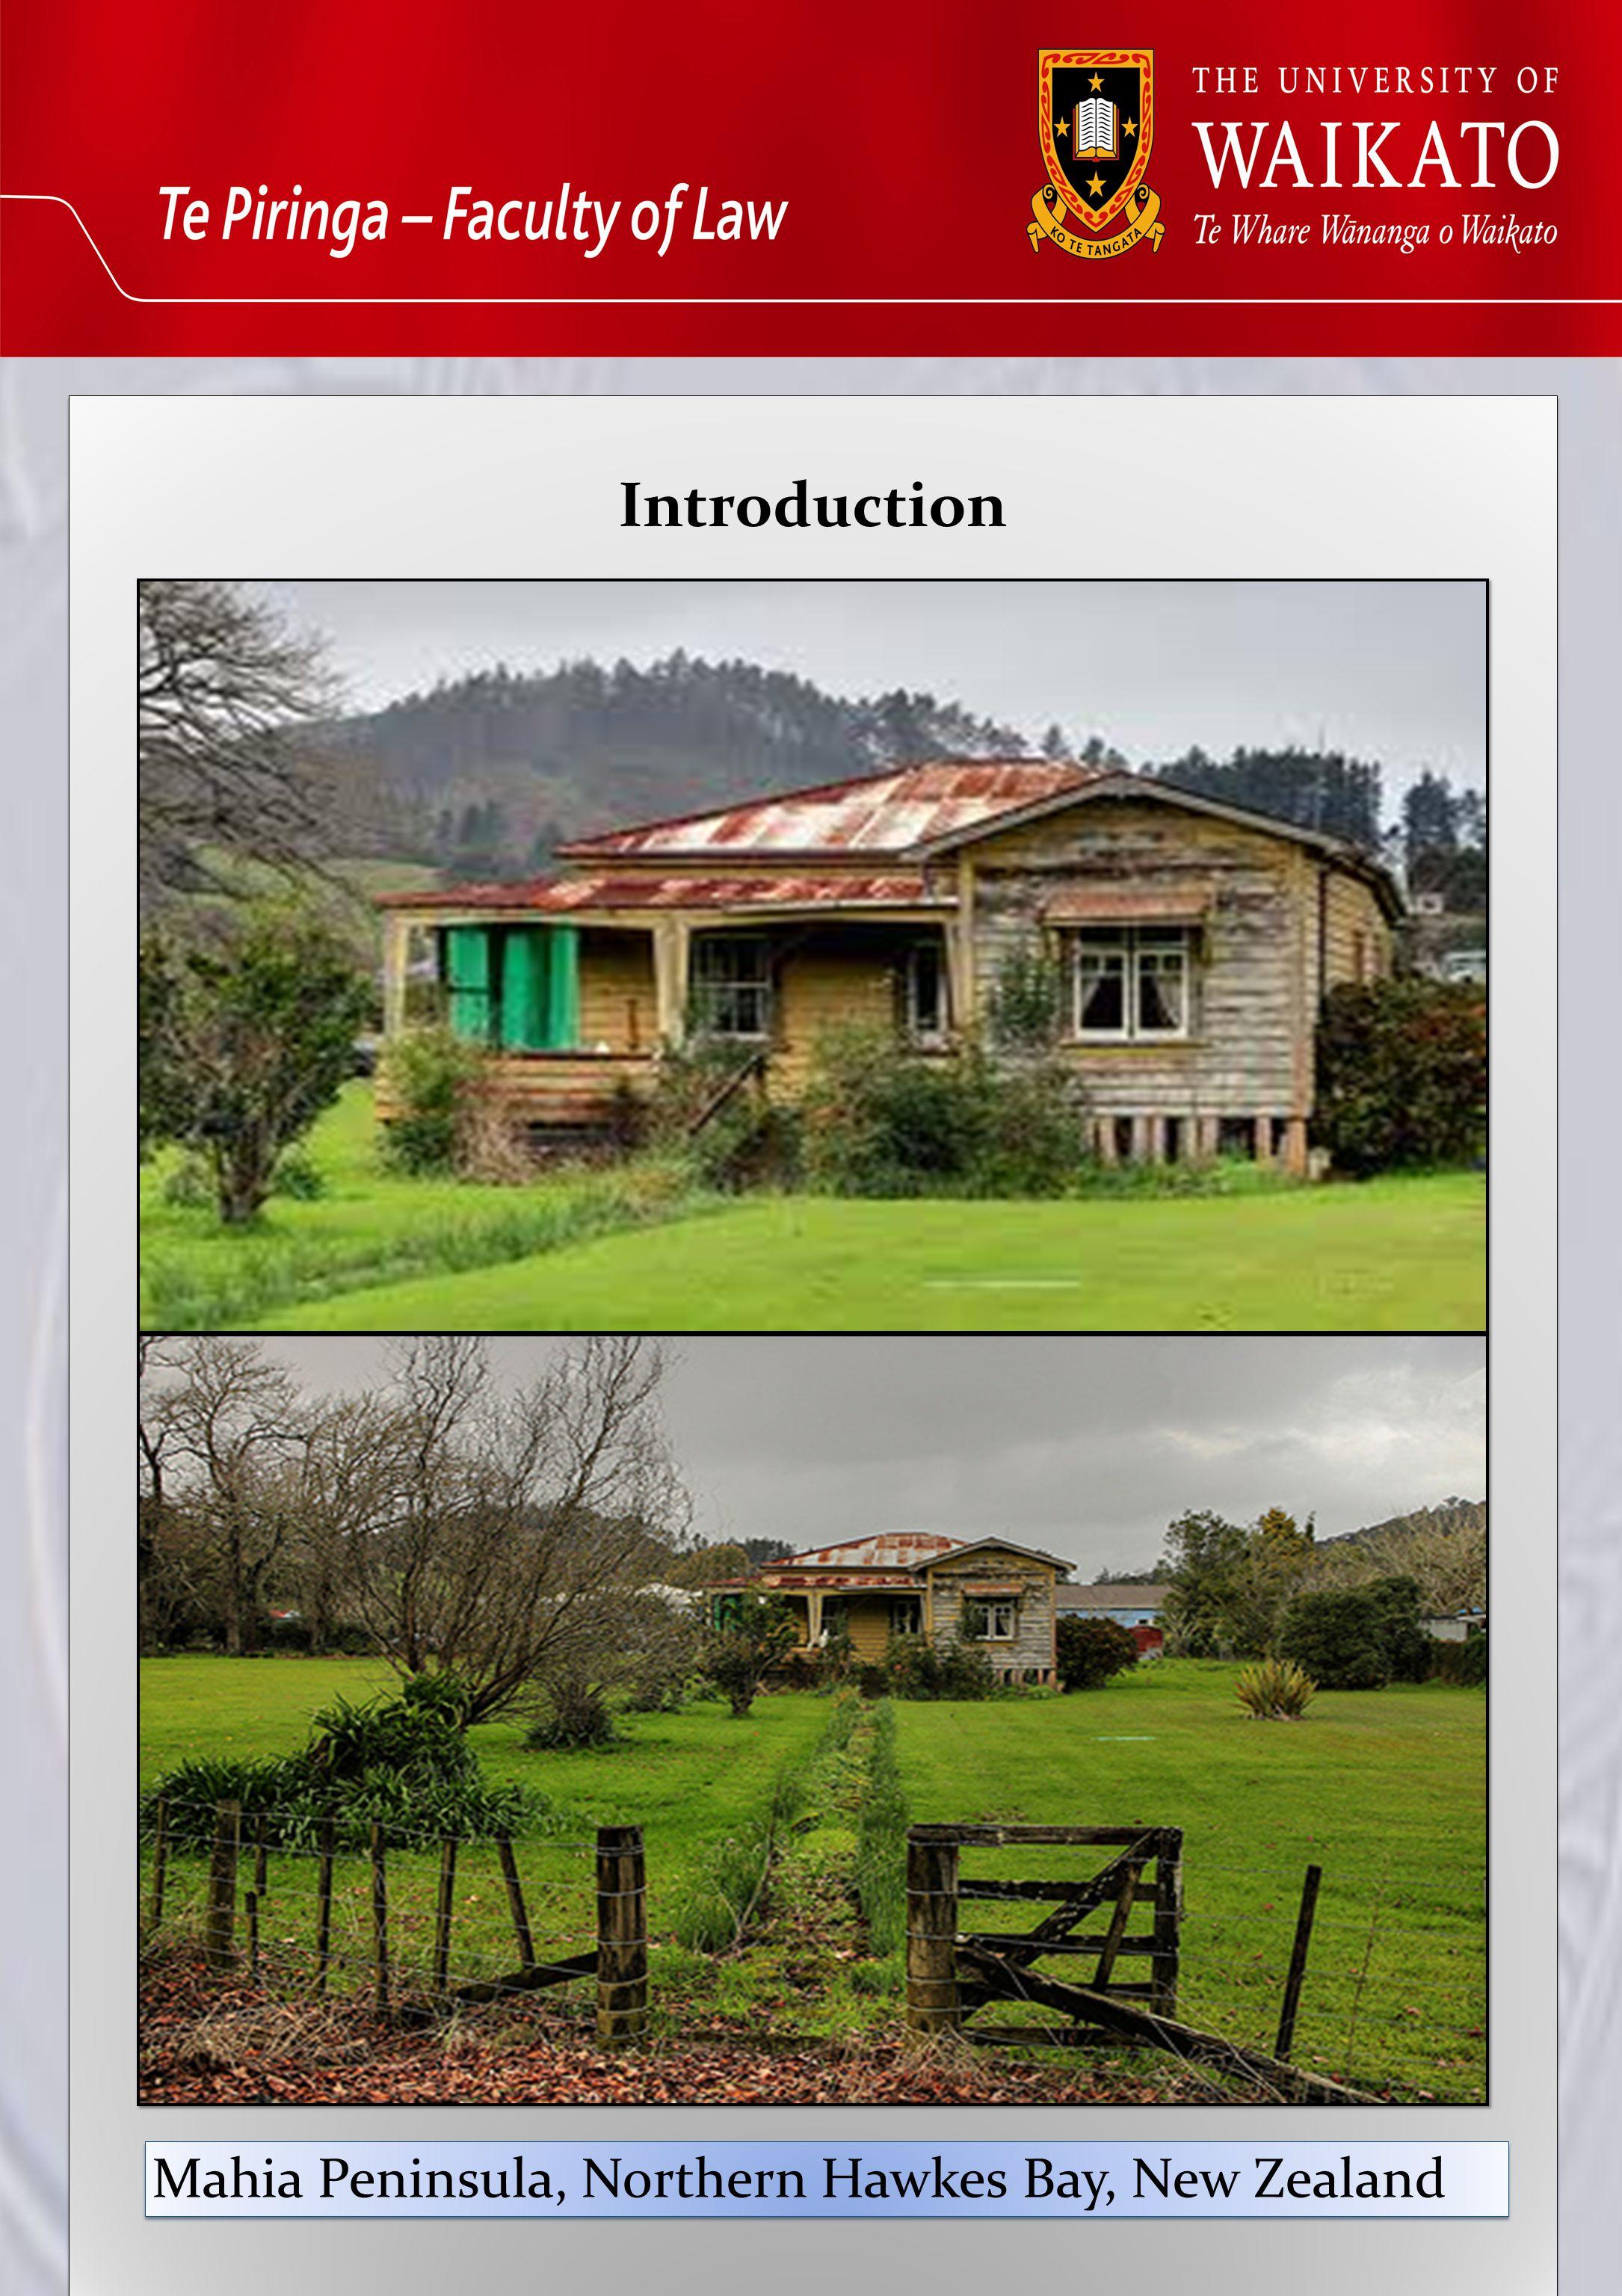 Introduction Introduction Mahia Peninsula, Northern Hawkes Bay, New Zealand